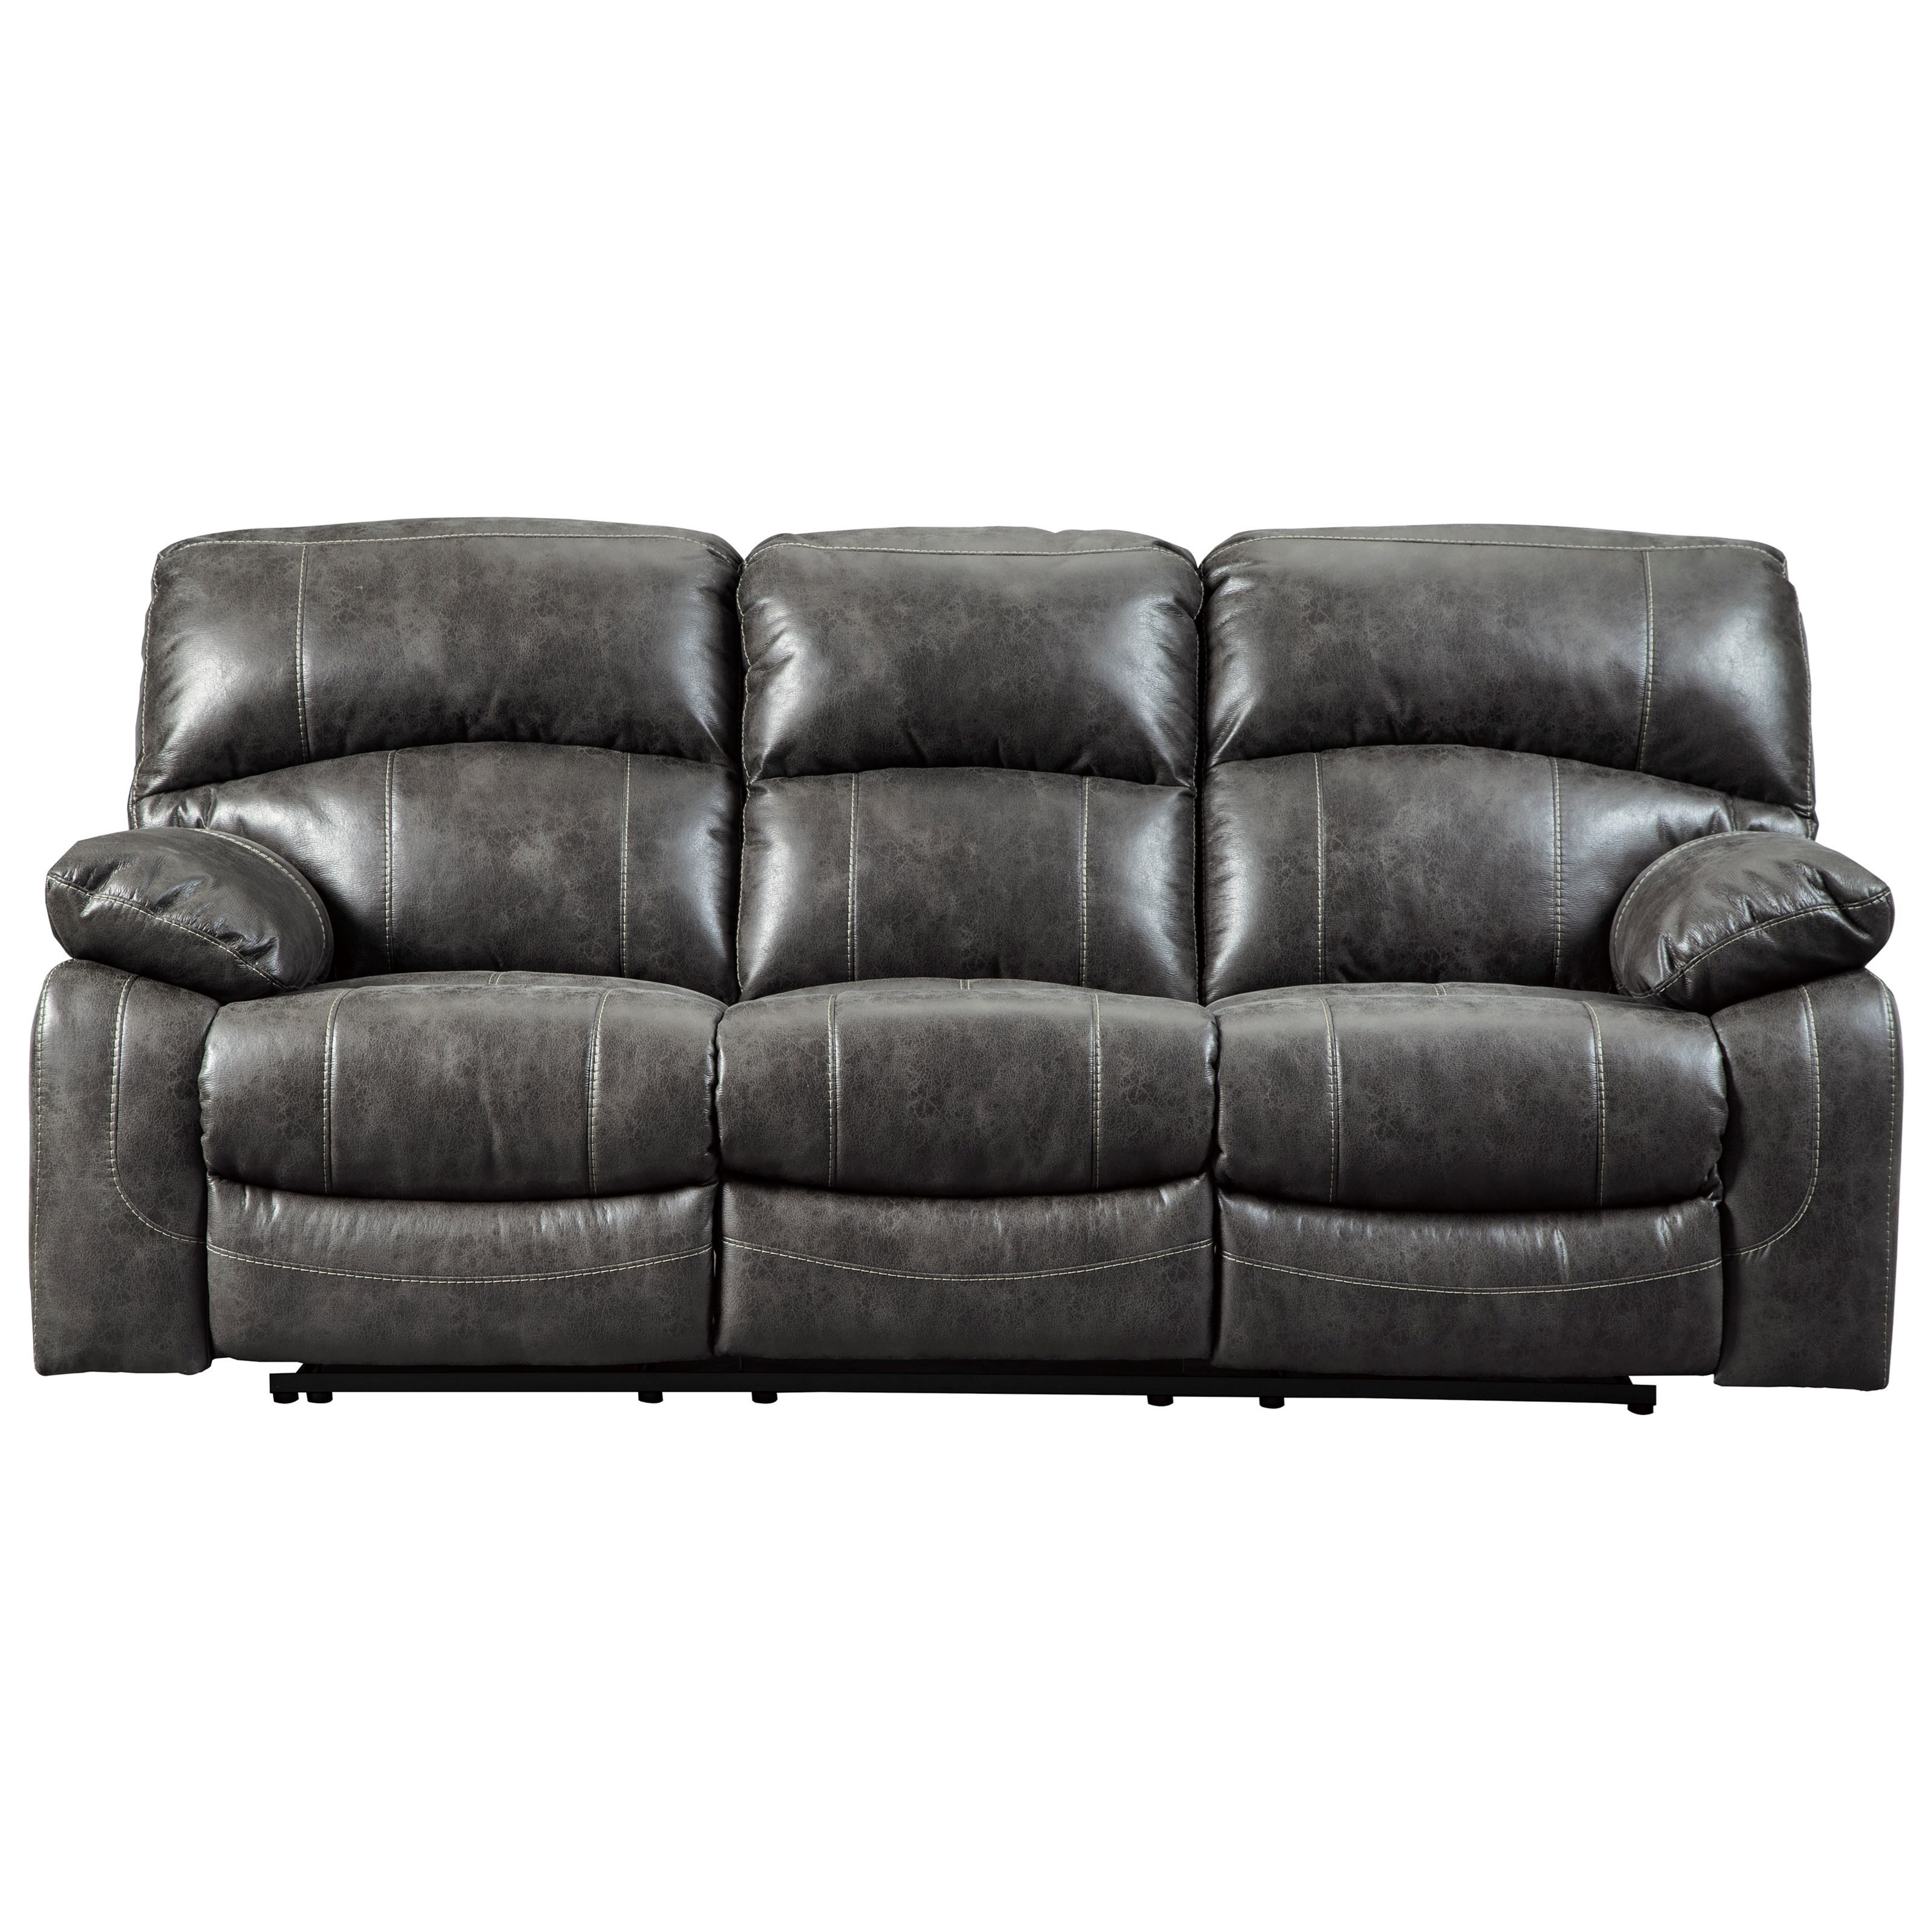 Dunwell Power Reclining Sofa W Adjustable Headrests